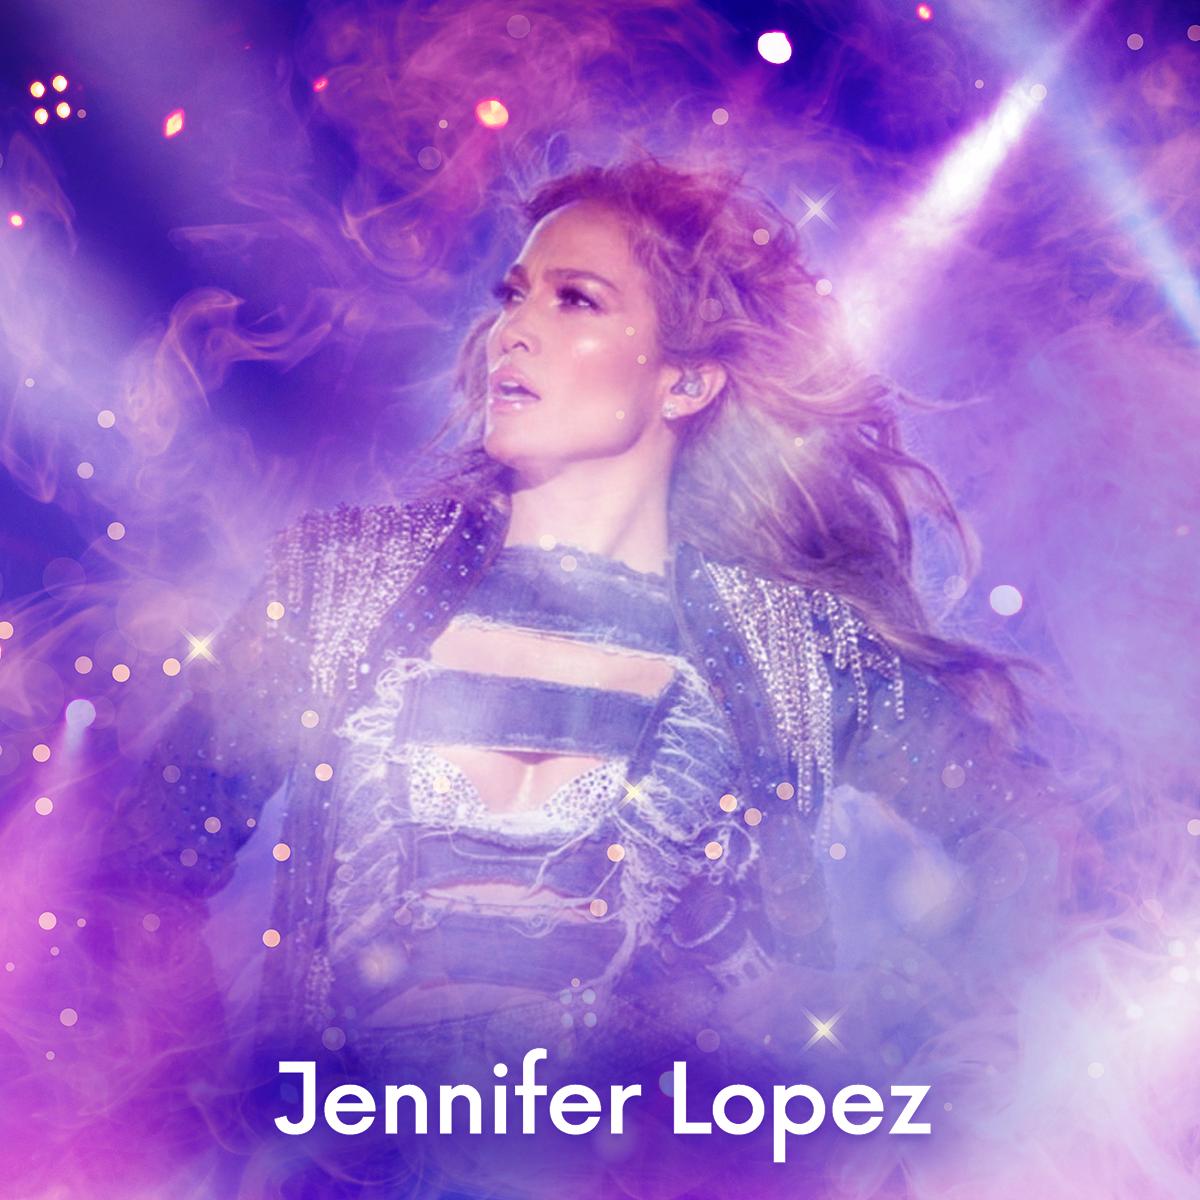 Image Jennifer Lopez